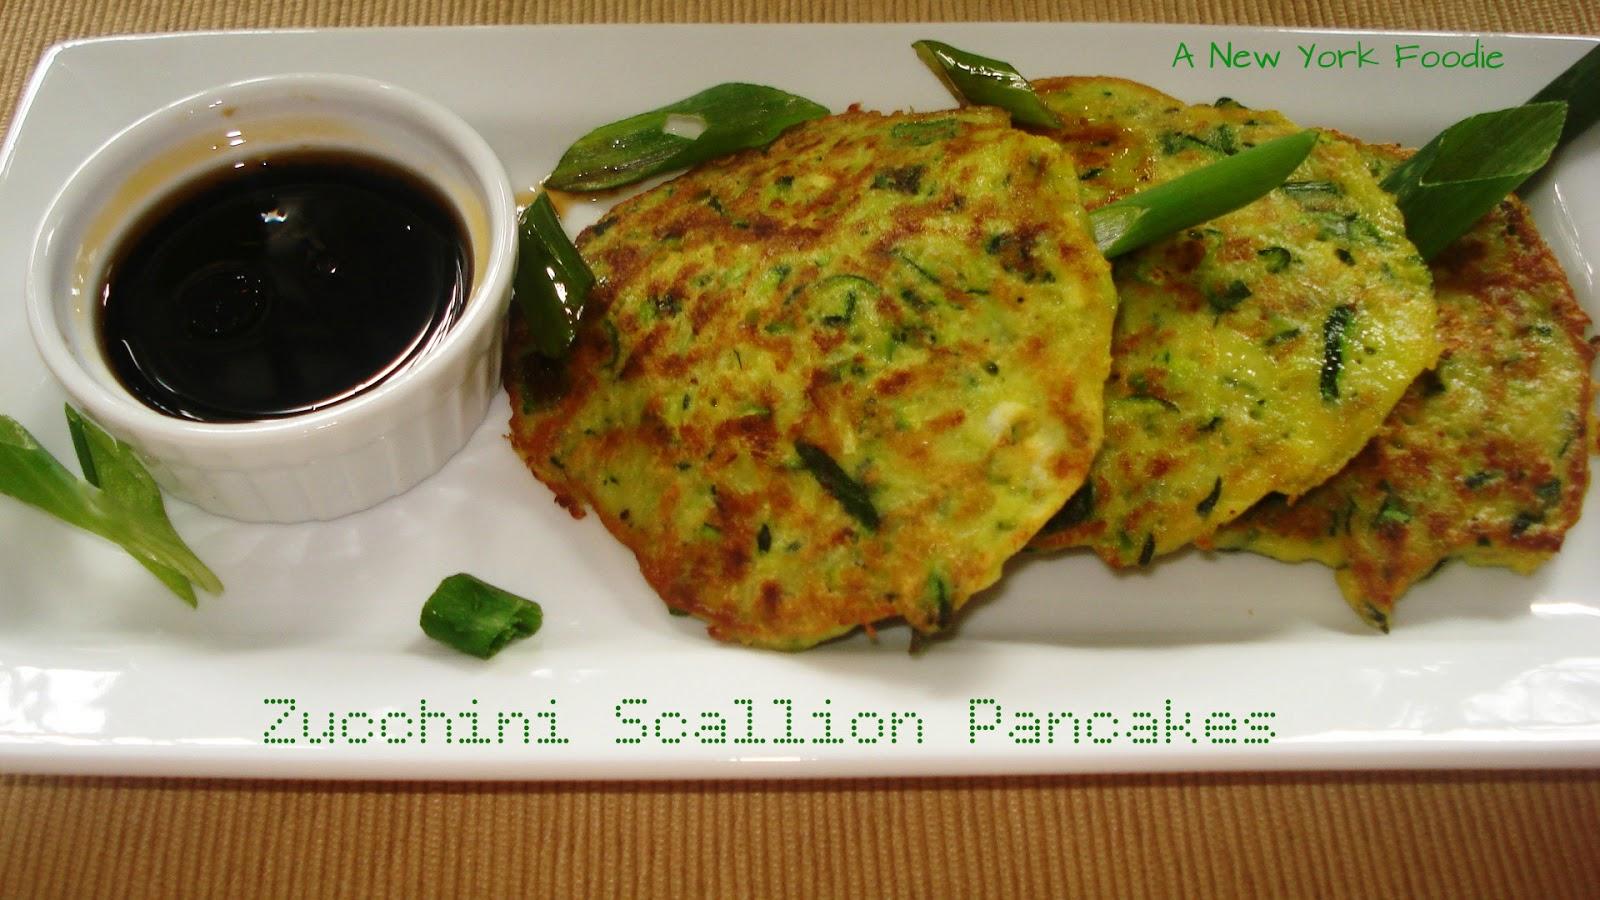 Zucchini Scallion Pancakes A New York Foodie